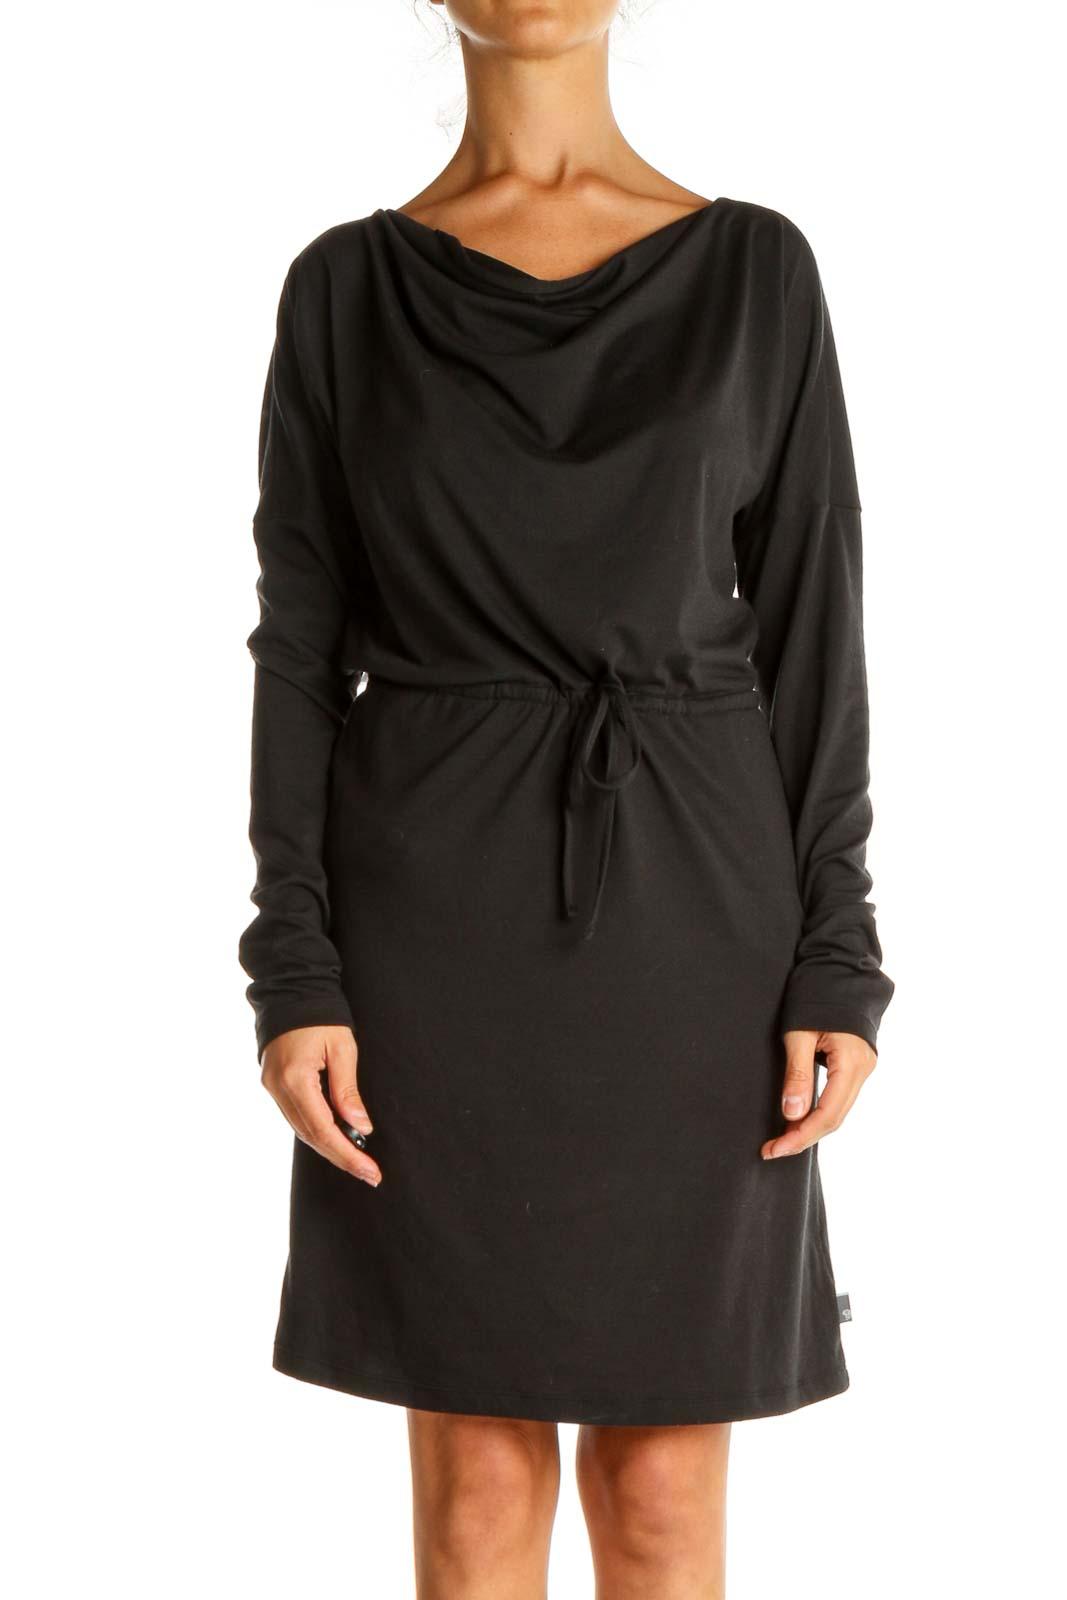 Black Solid Sporty Sheath Dress Front